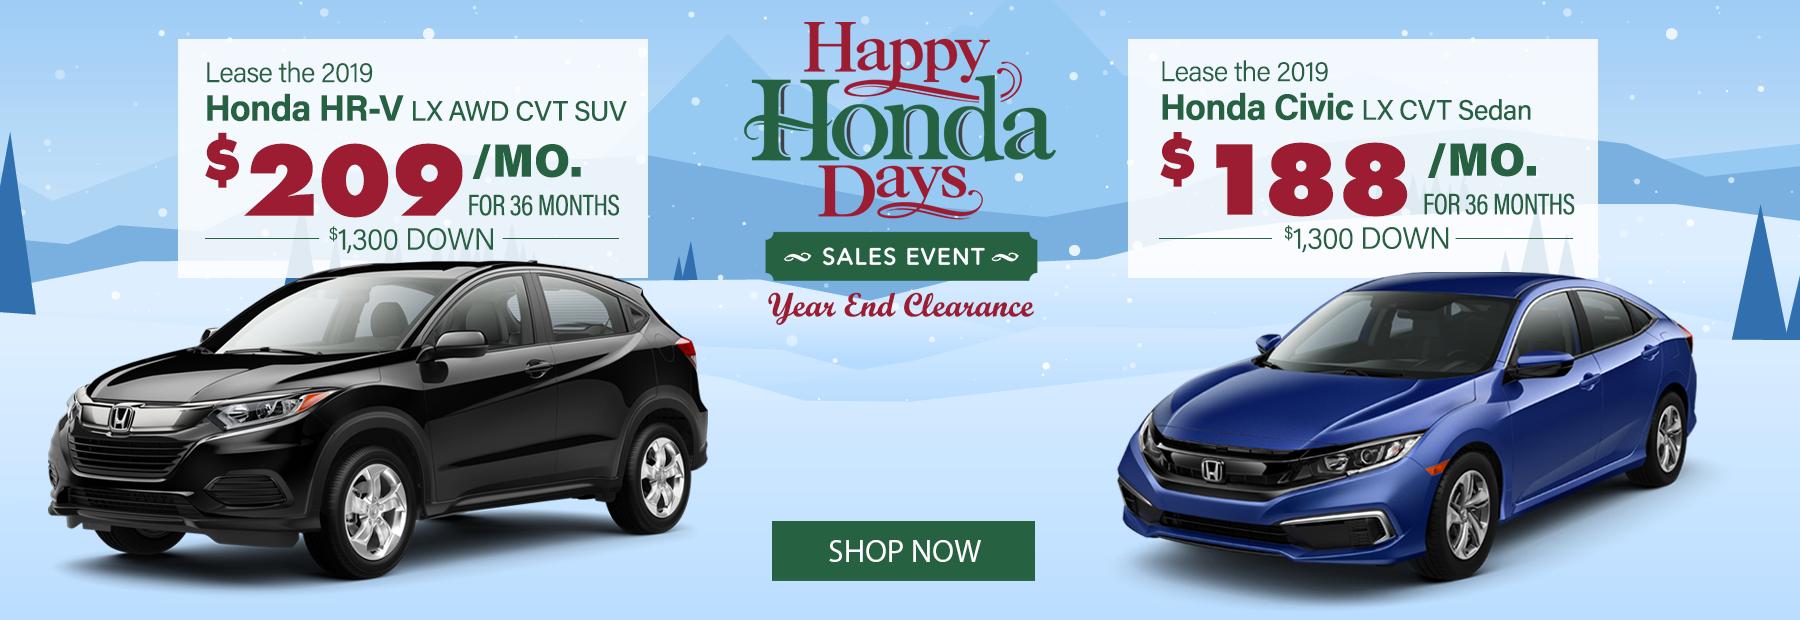 Honda Dealership Columbus Ohio >> Performance Kings Honda New Honda Sales Service Kings